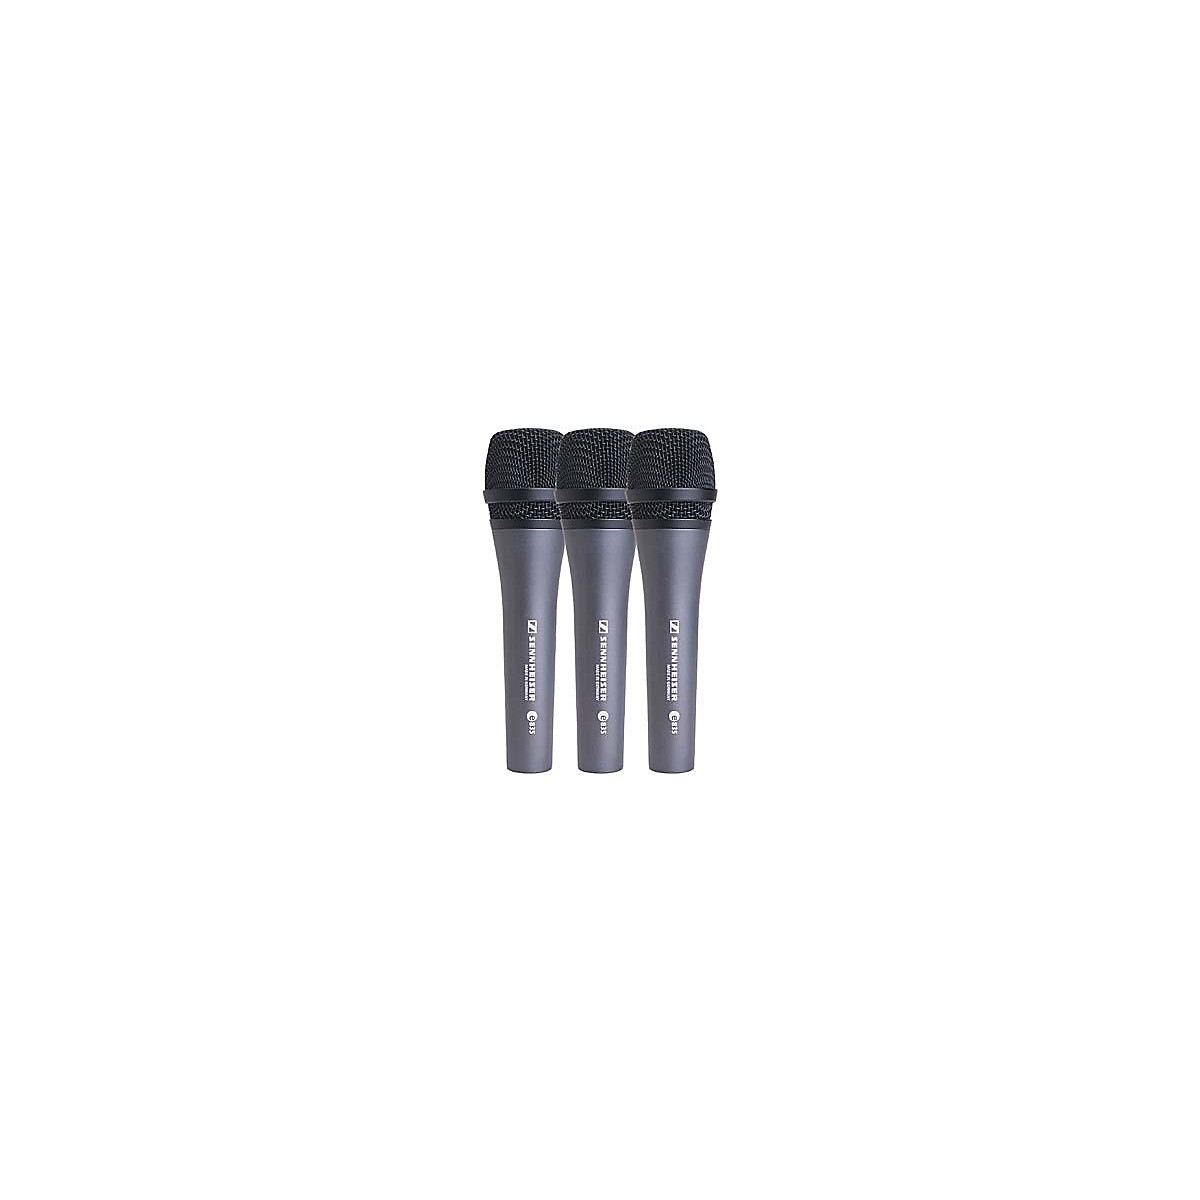 Sennheiser e 835 Cardioid Dynamic Vocal Microphone 3-Pack